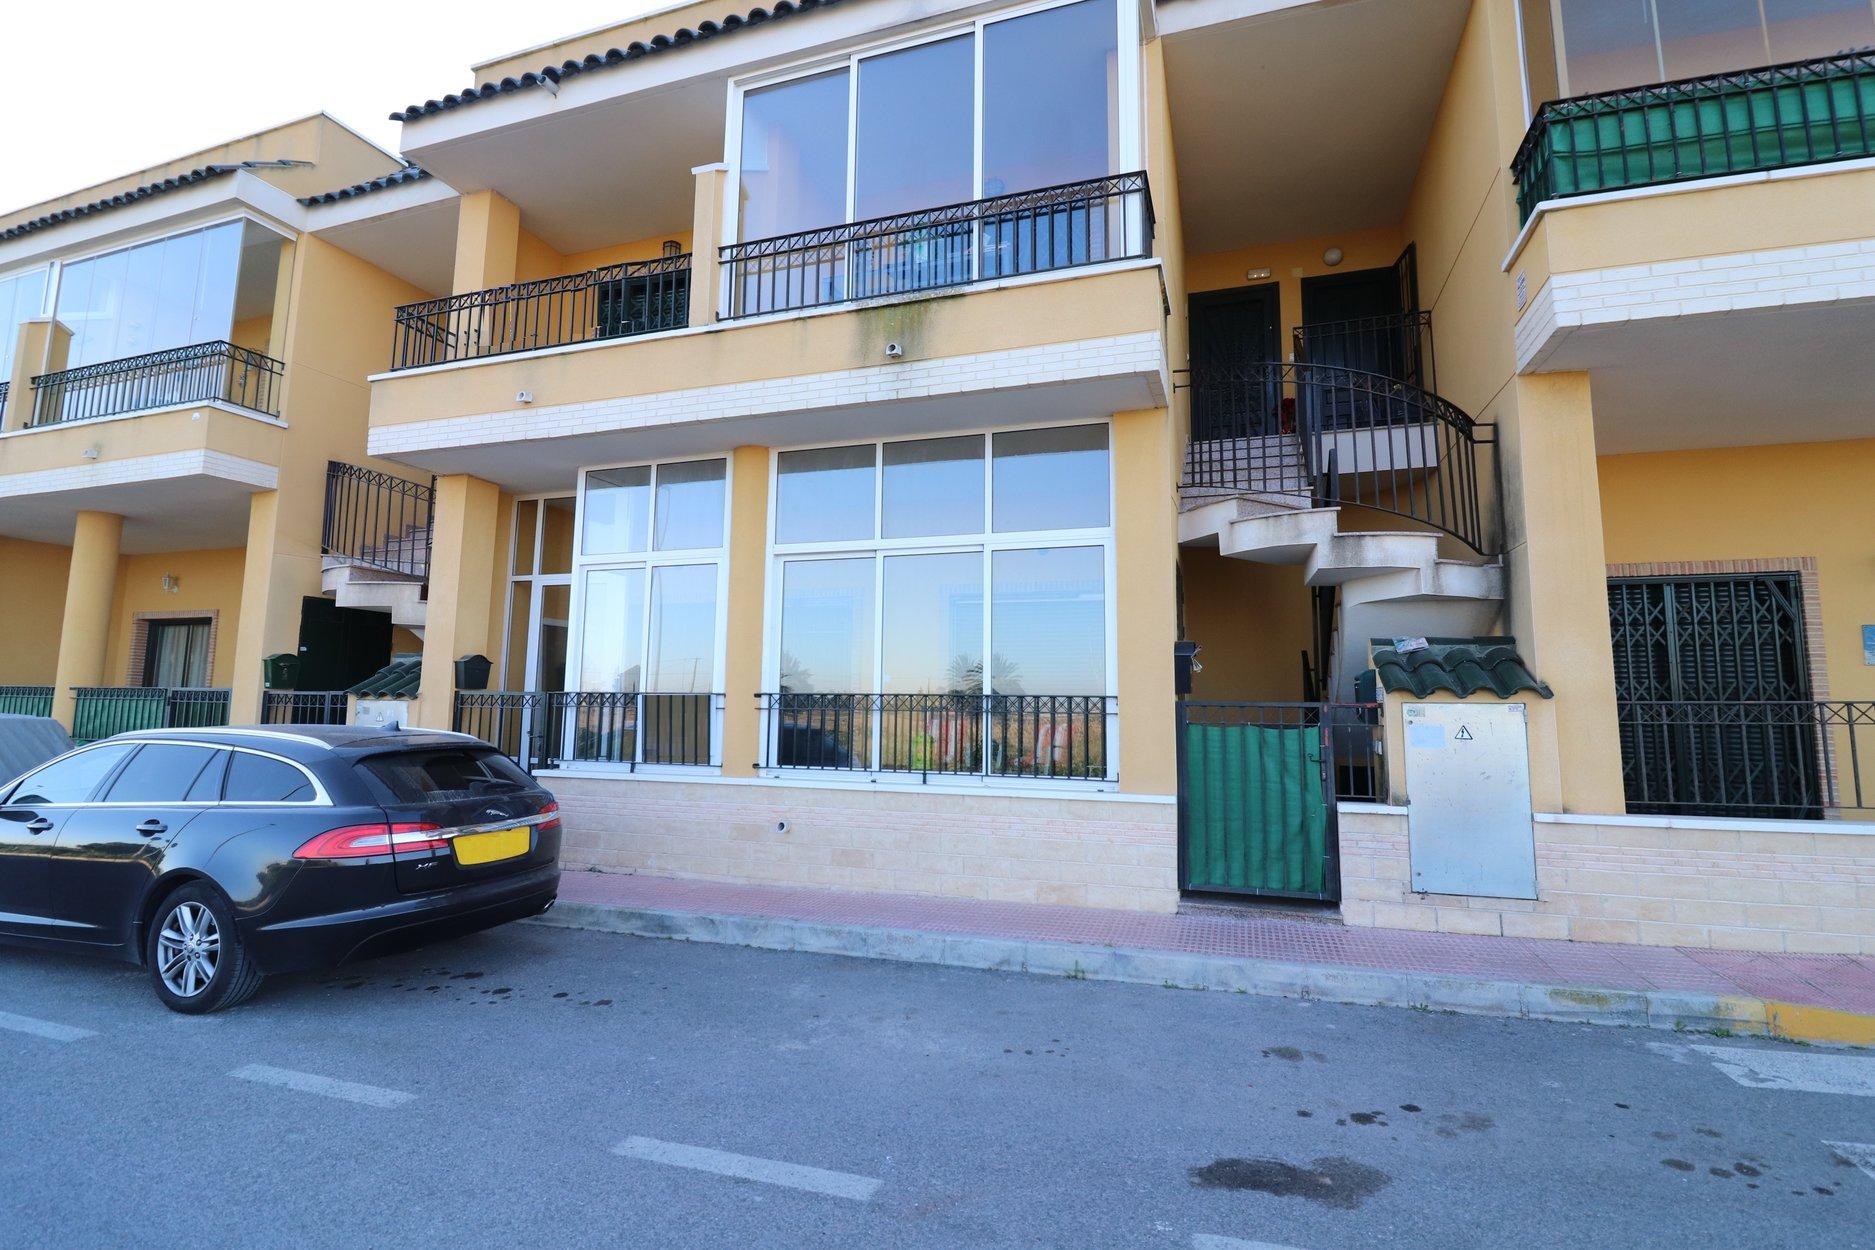 Apartment for sale in Daya Vieja - Costa Blanca